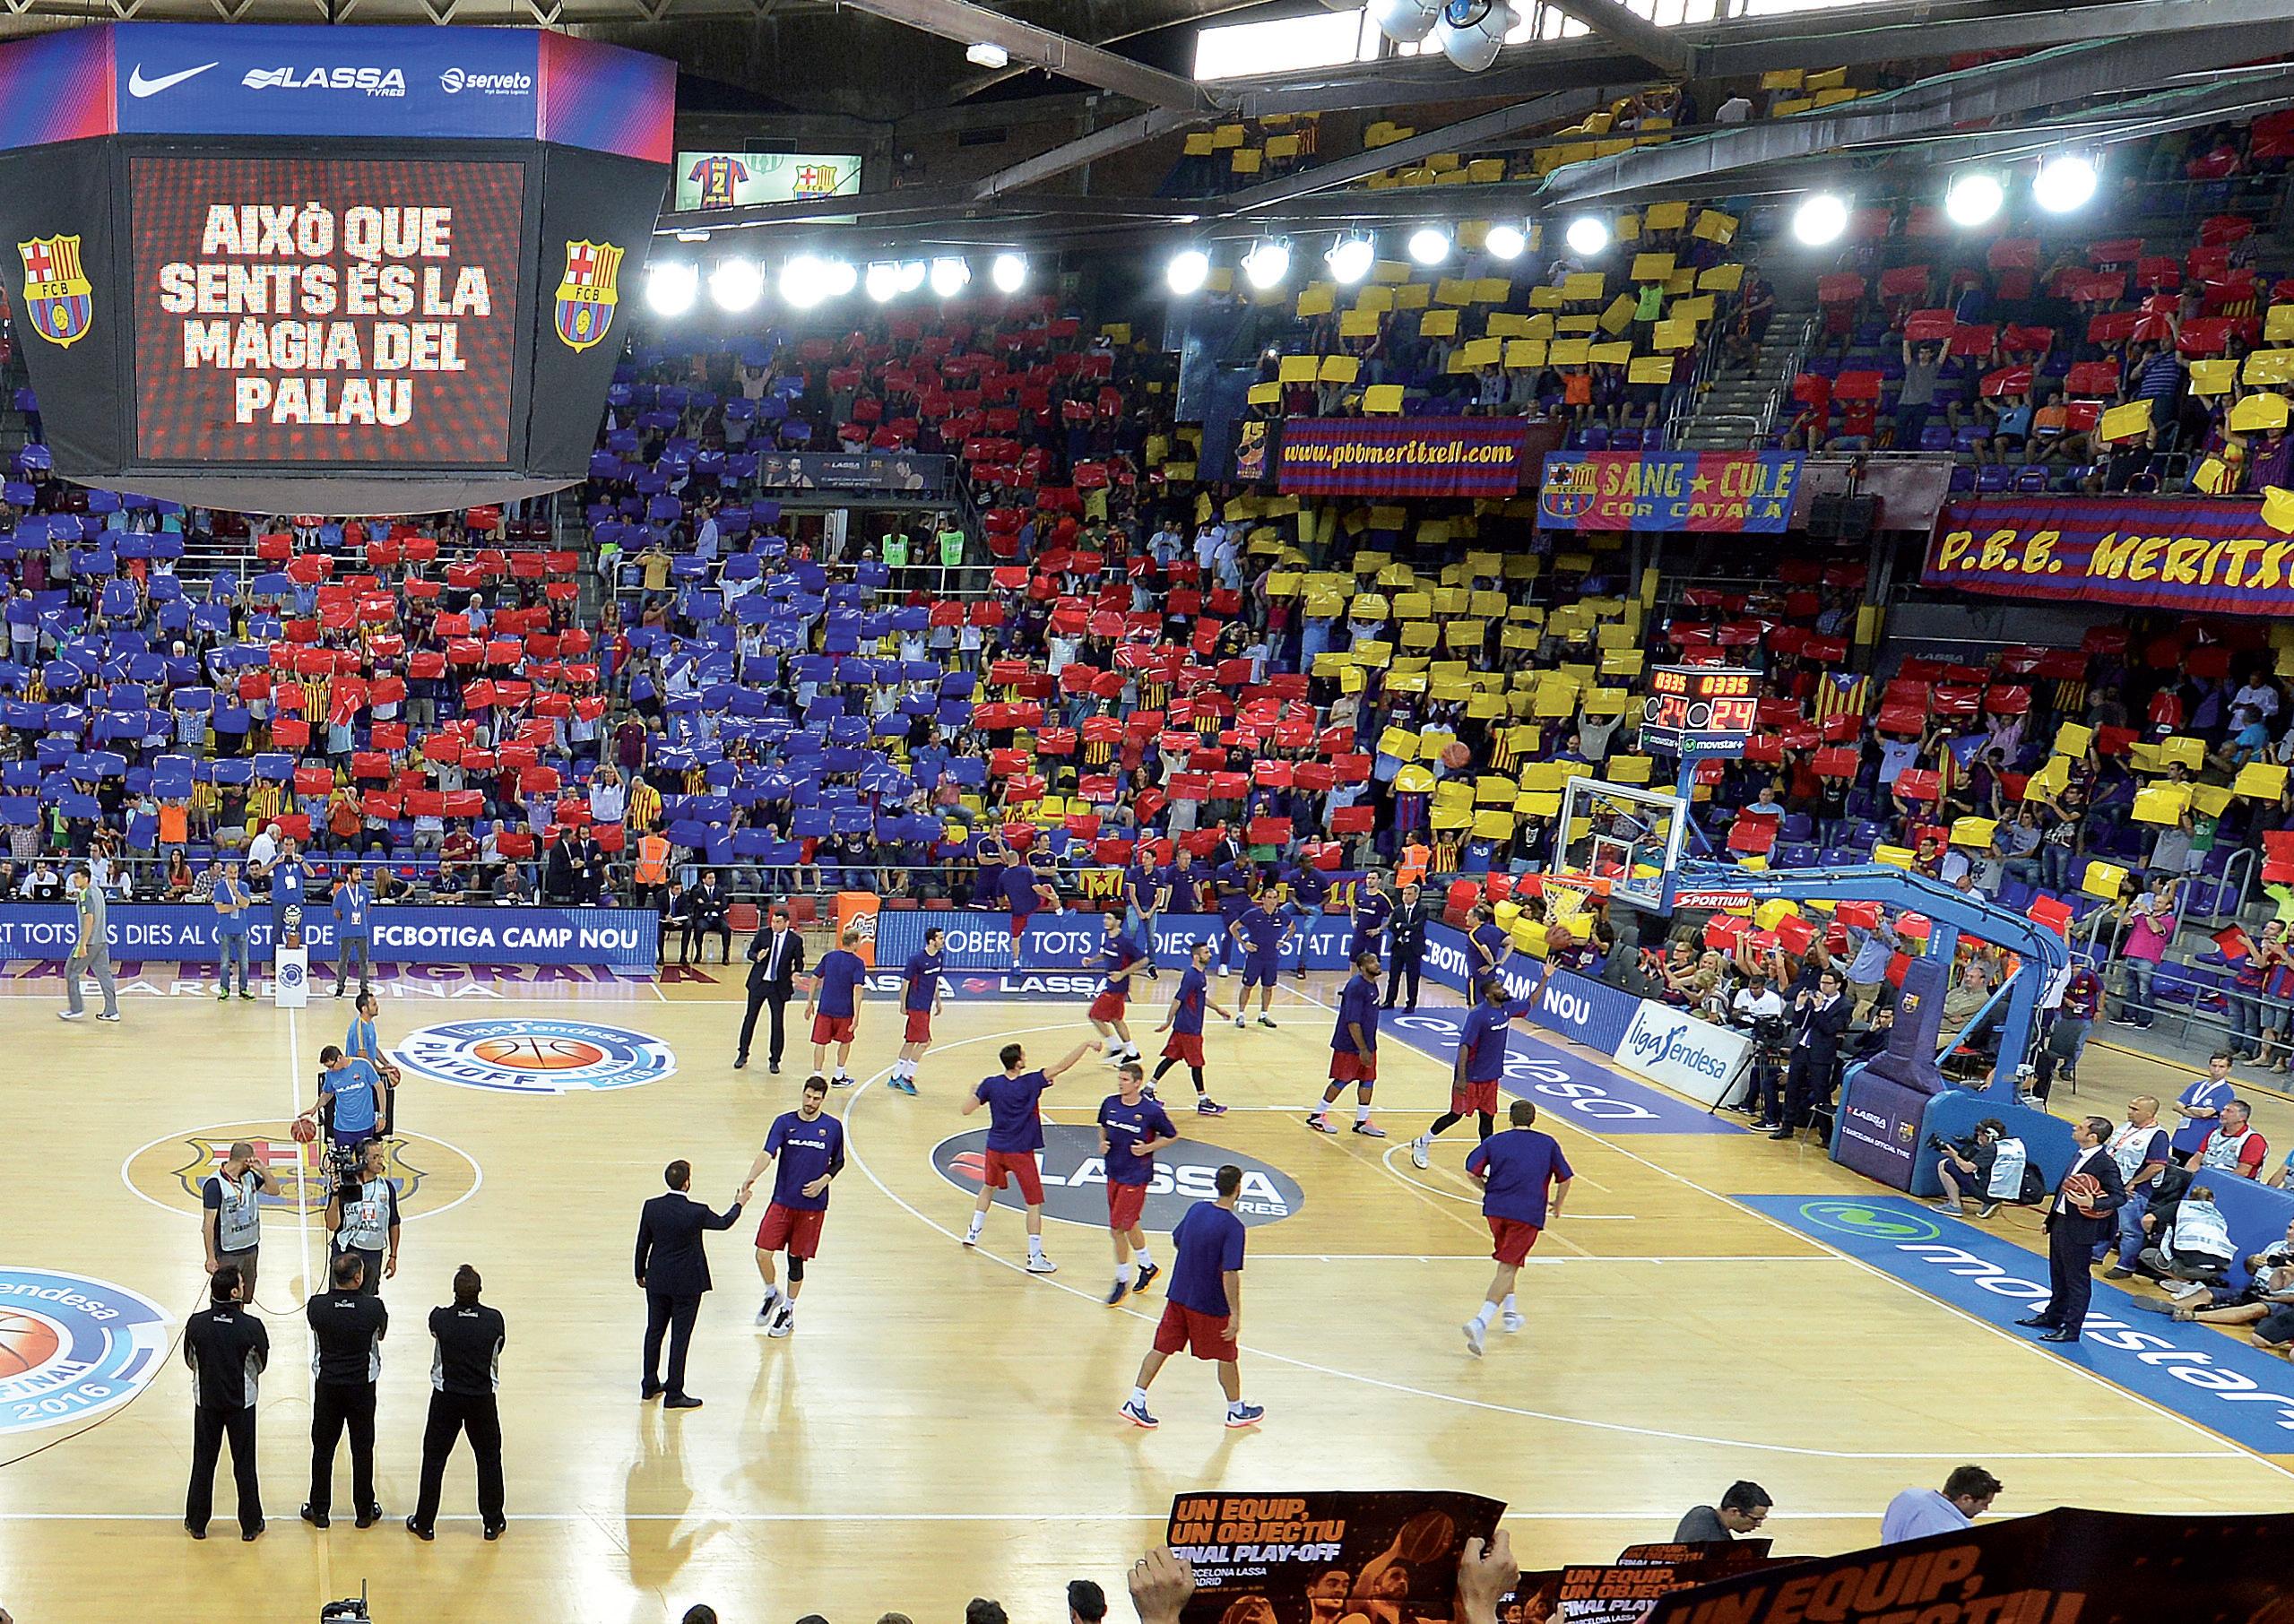 Time de basquete do Barcelona, mostrando a versatilidade da marca